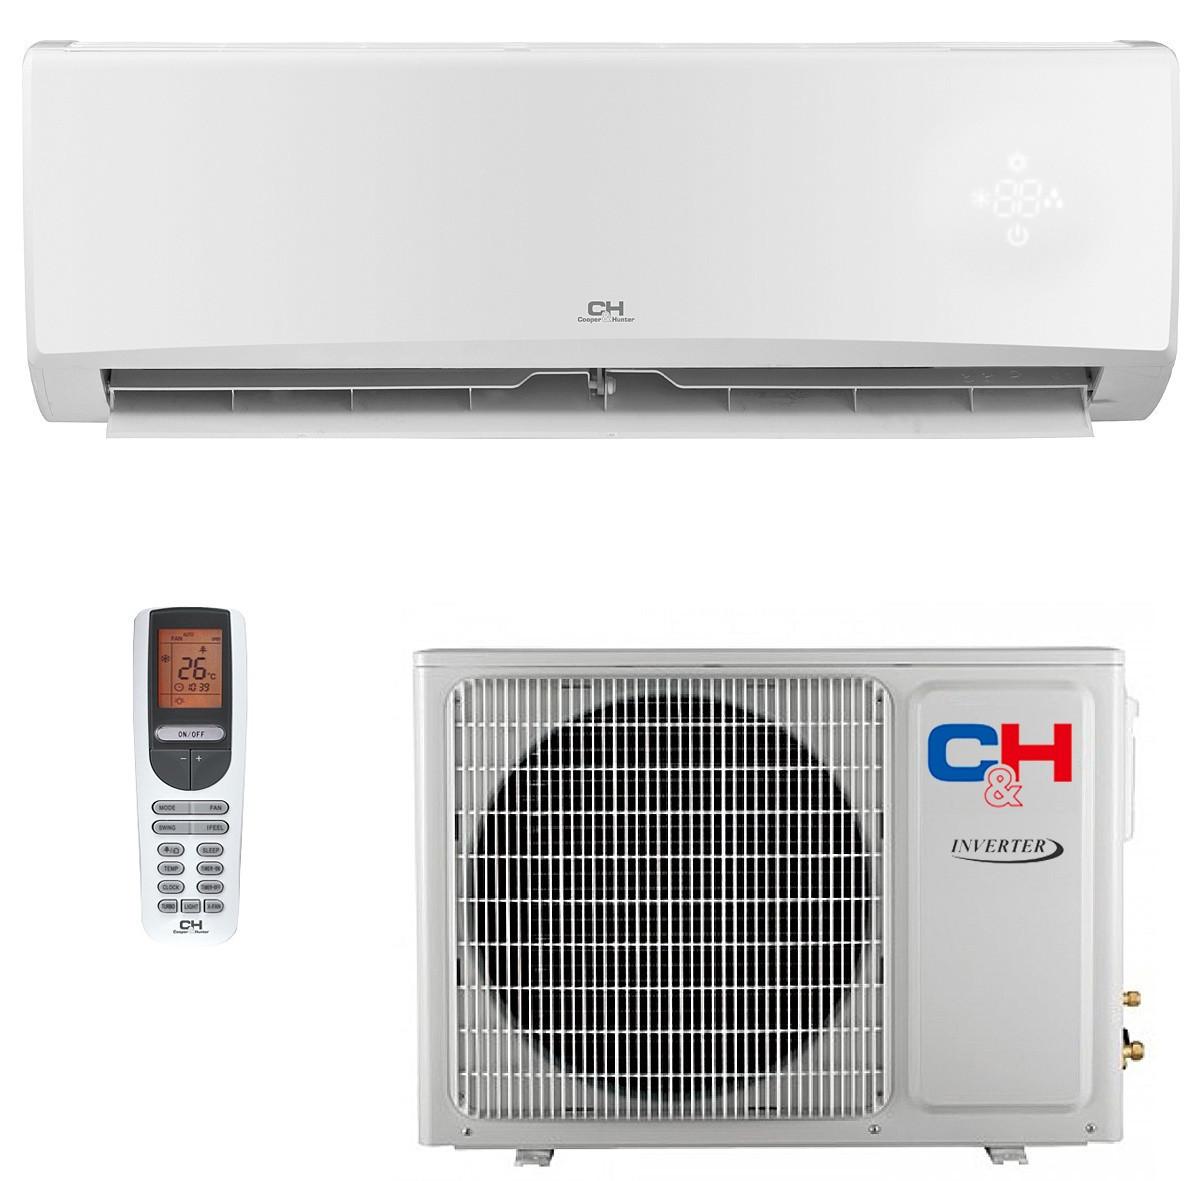 Кондиционер инверторный сплит-система Cooper&Hunter Alpha Inverter CH-S24FTXL2E-NG R32 Wi-Fi